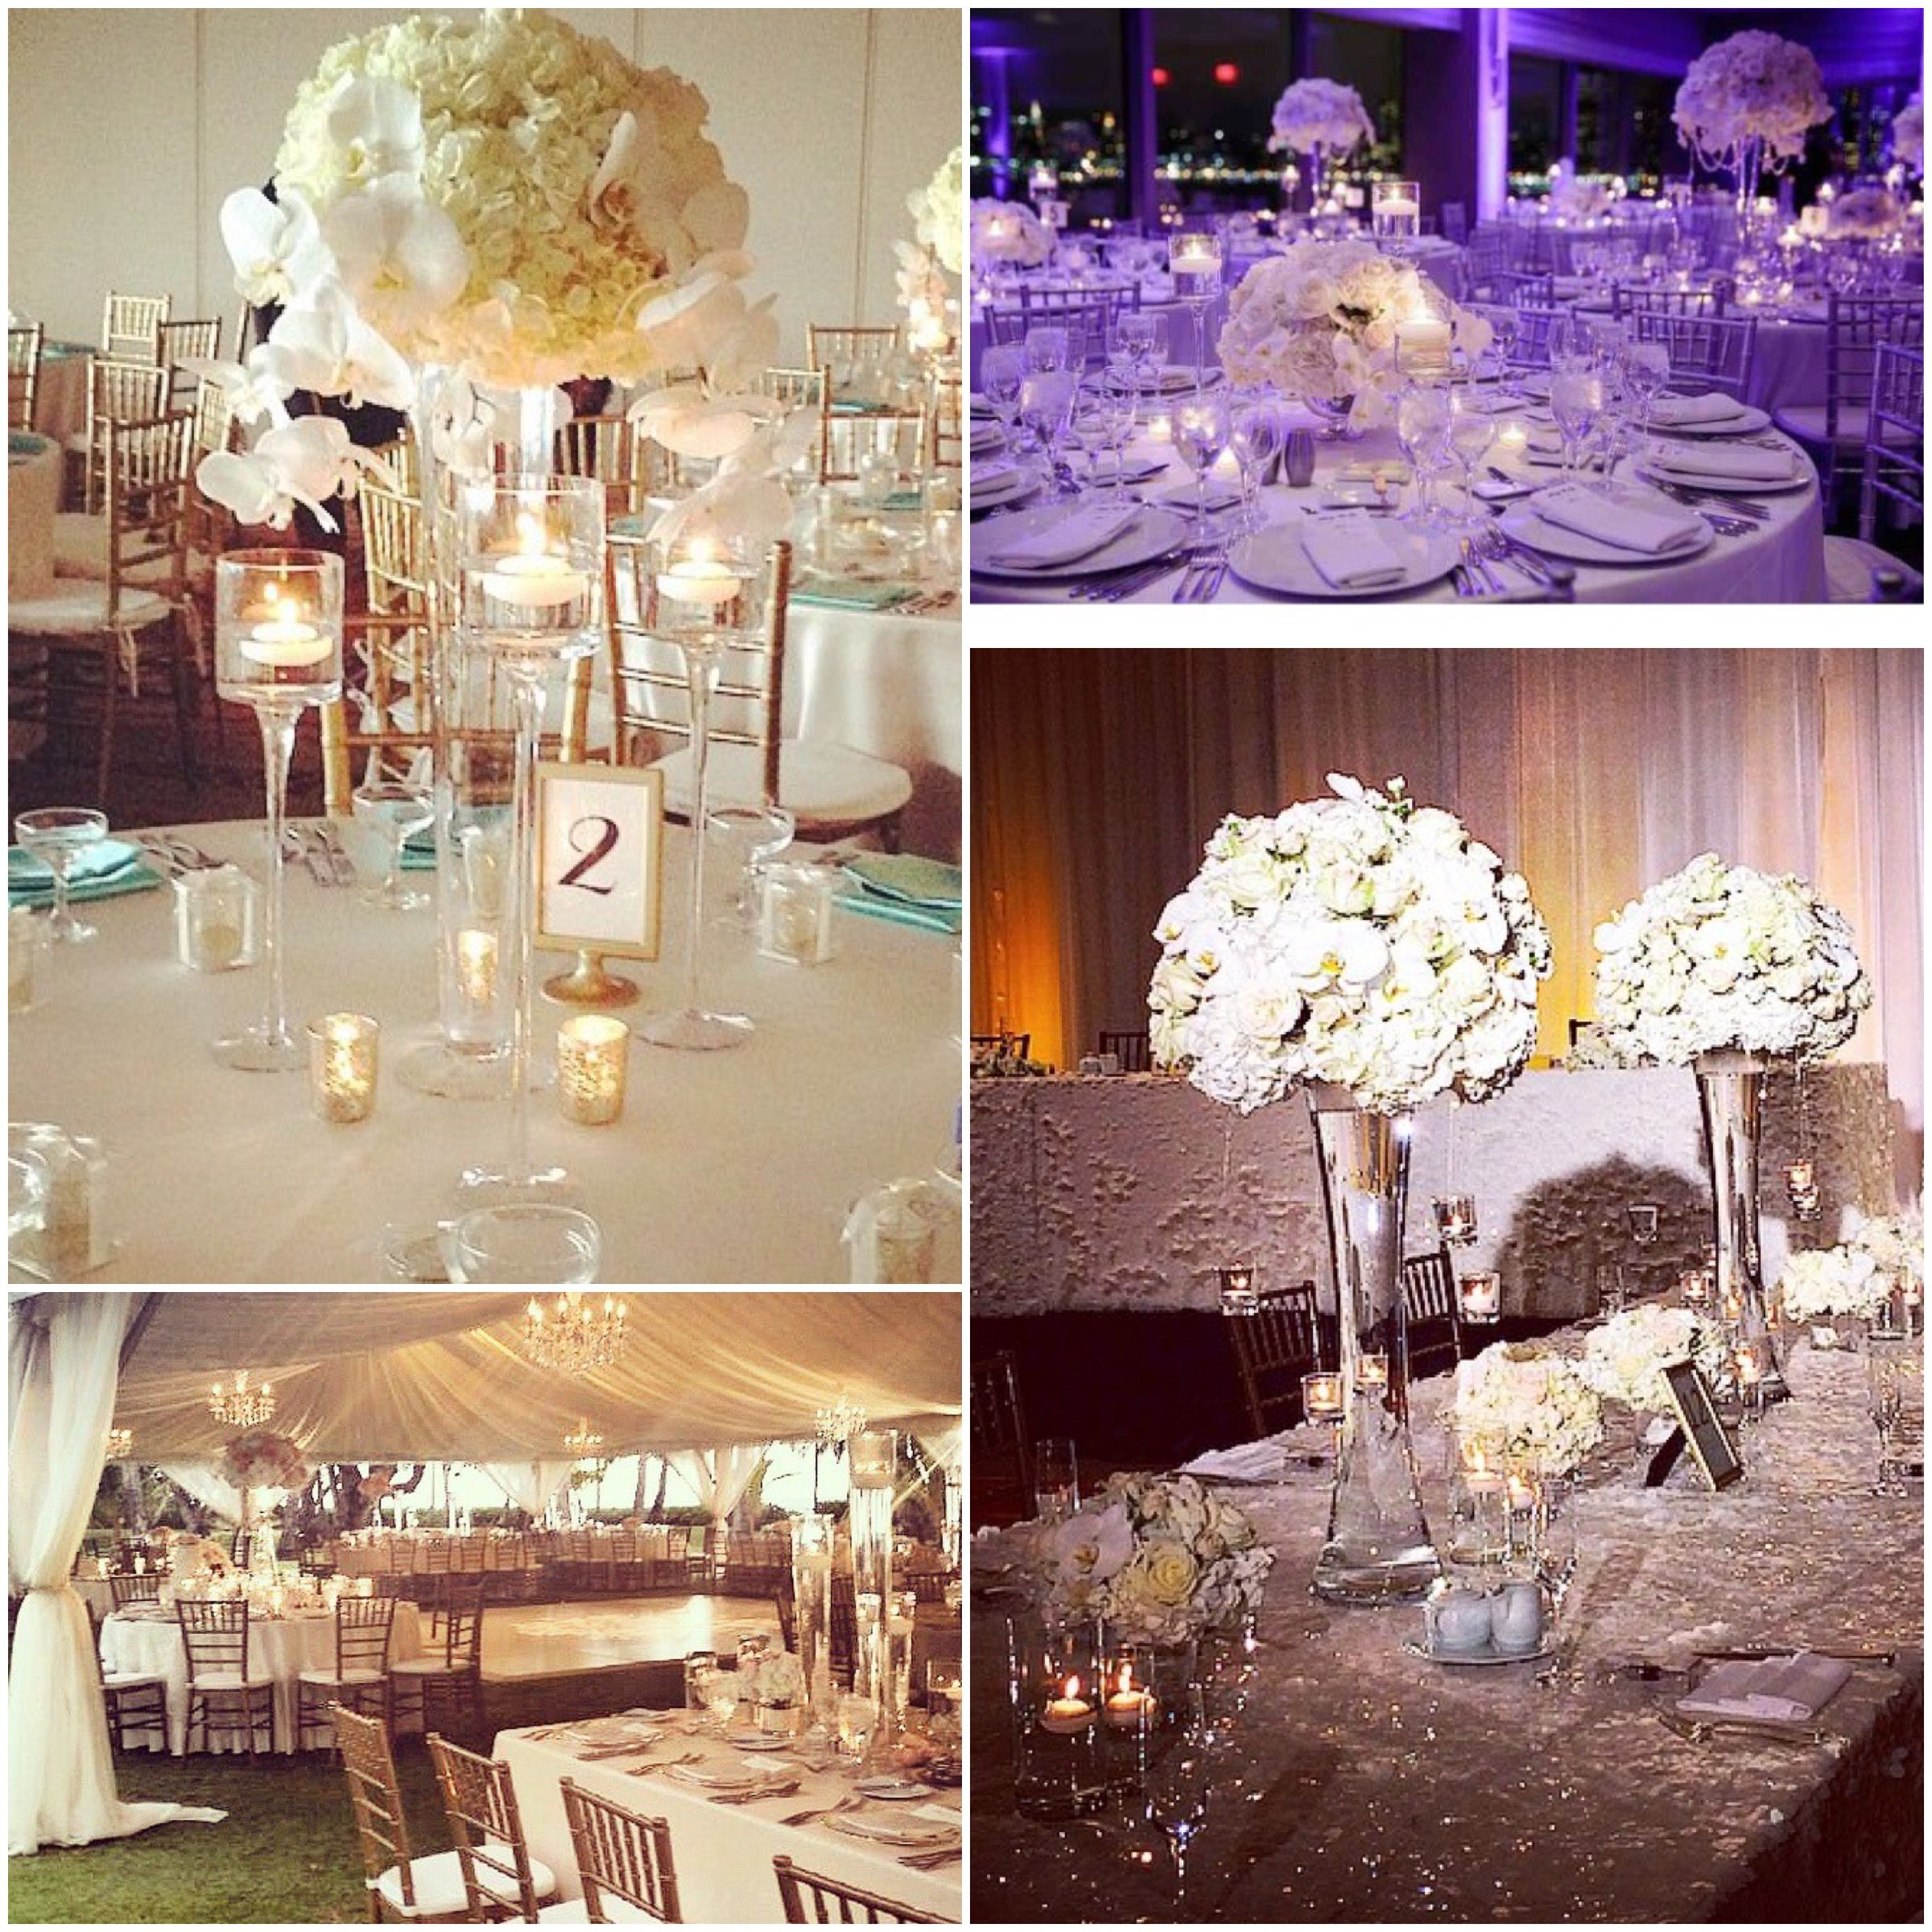 Soft Romantic Elegant Wedding Ideas: More Centerpiece Ideas, Tall, Round, Soft White